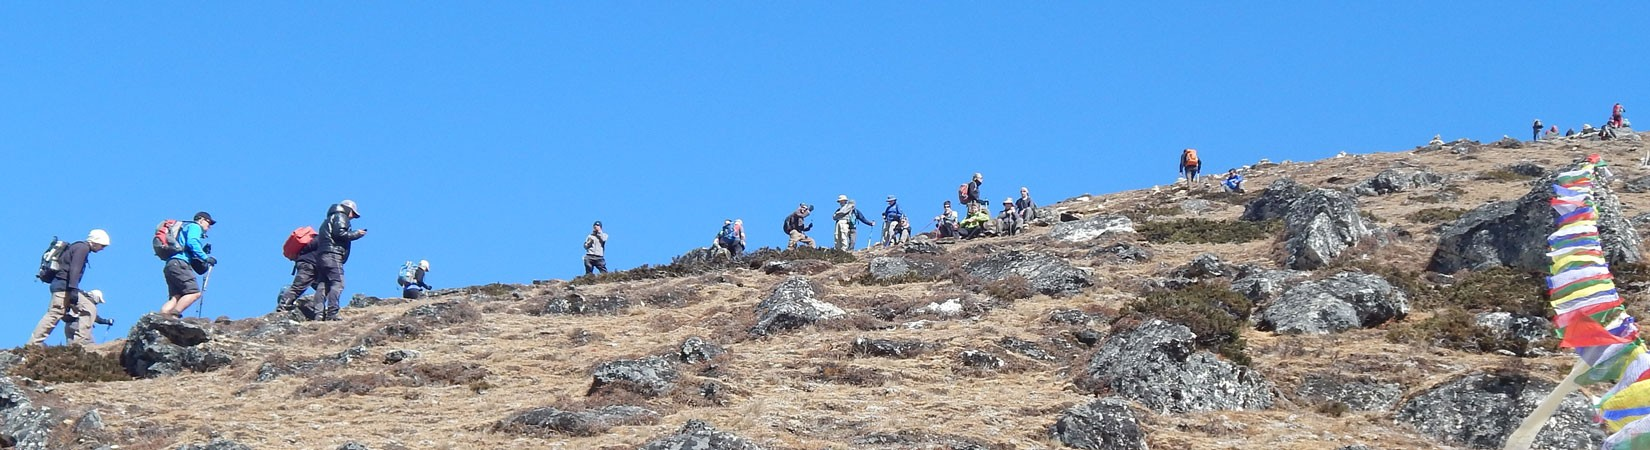 Everest Region Trekking in Nepal